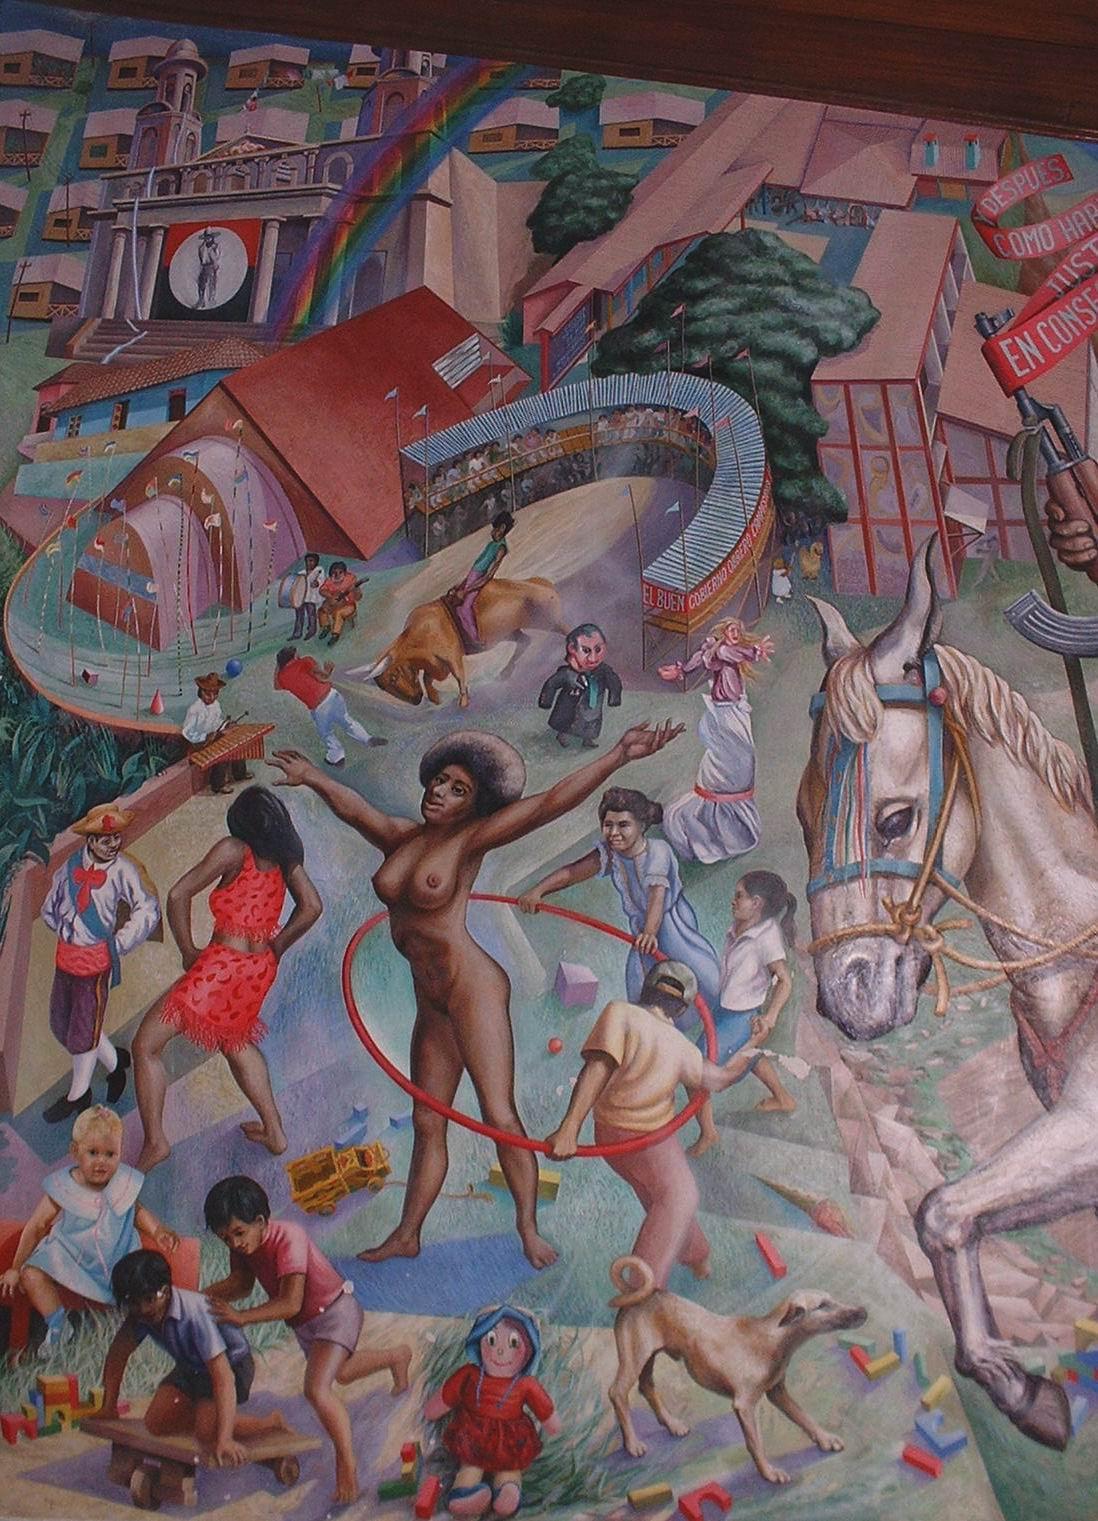 1987-1a-il-buon-governocemoarmanagua-nicaragua